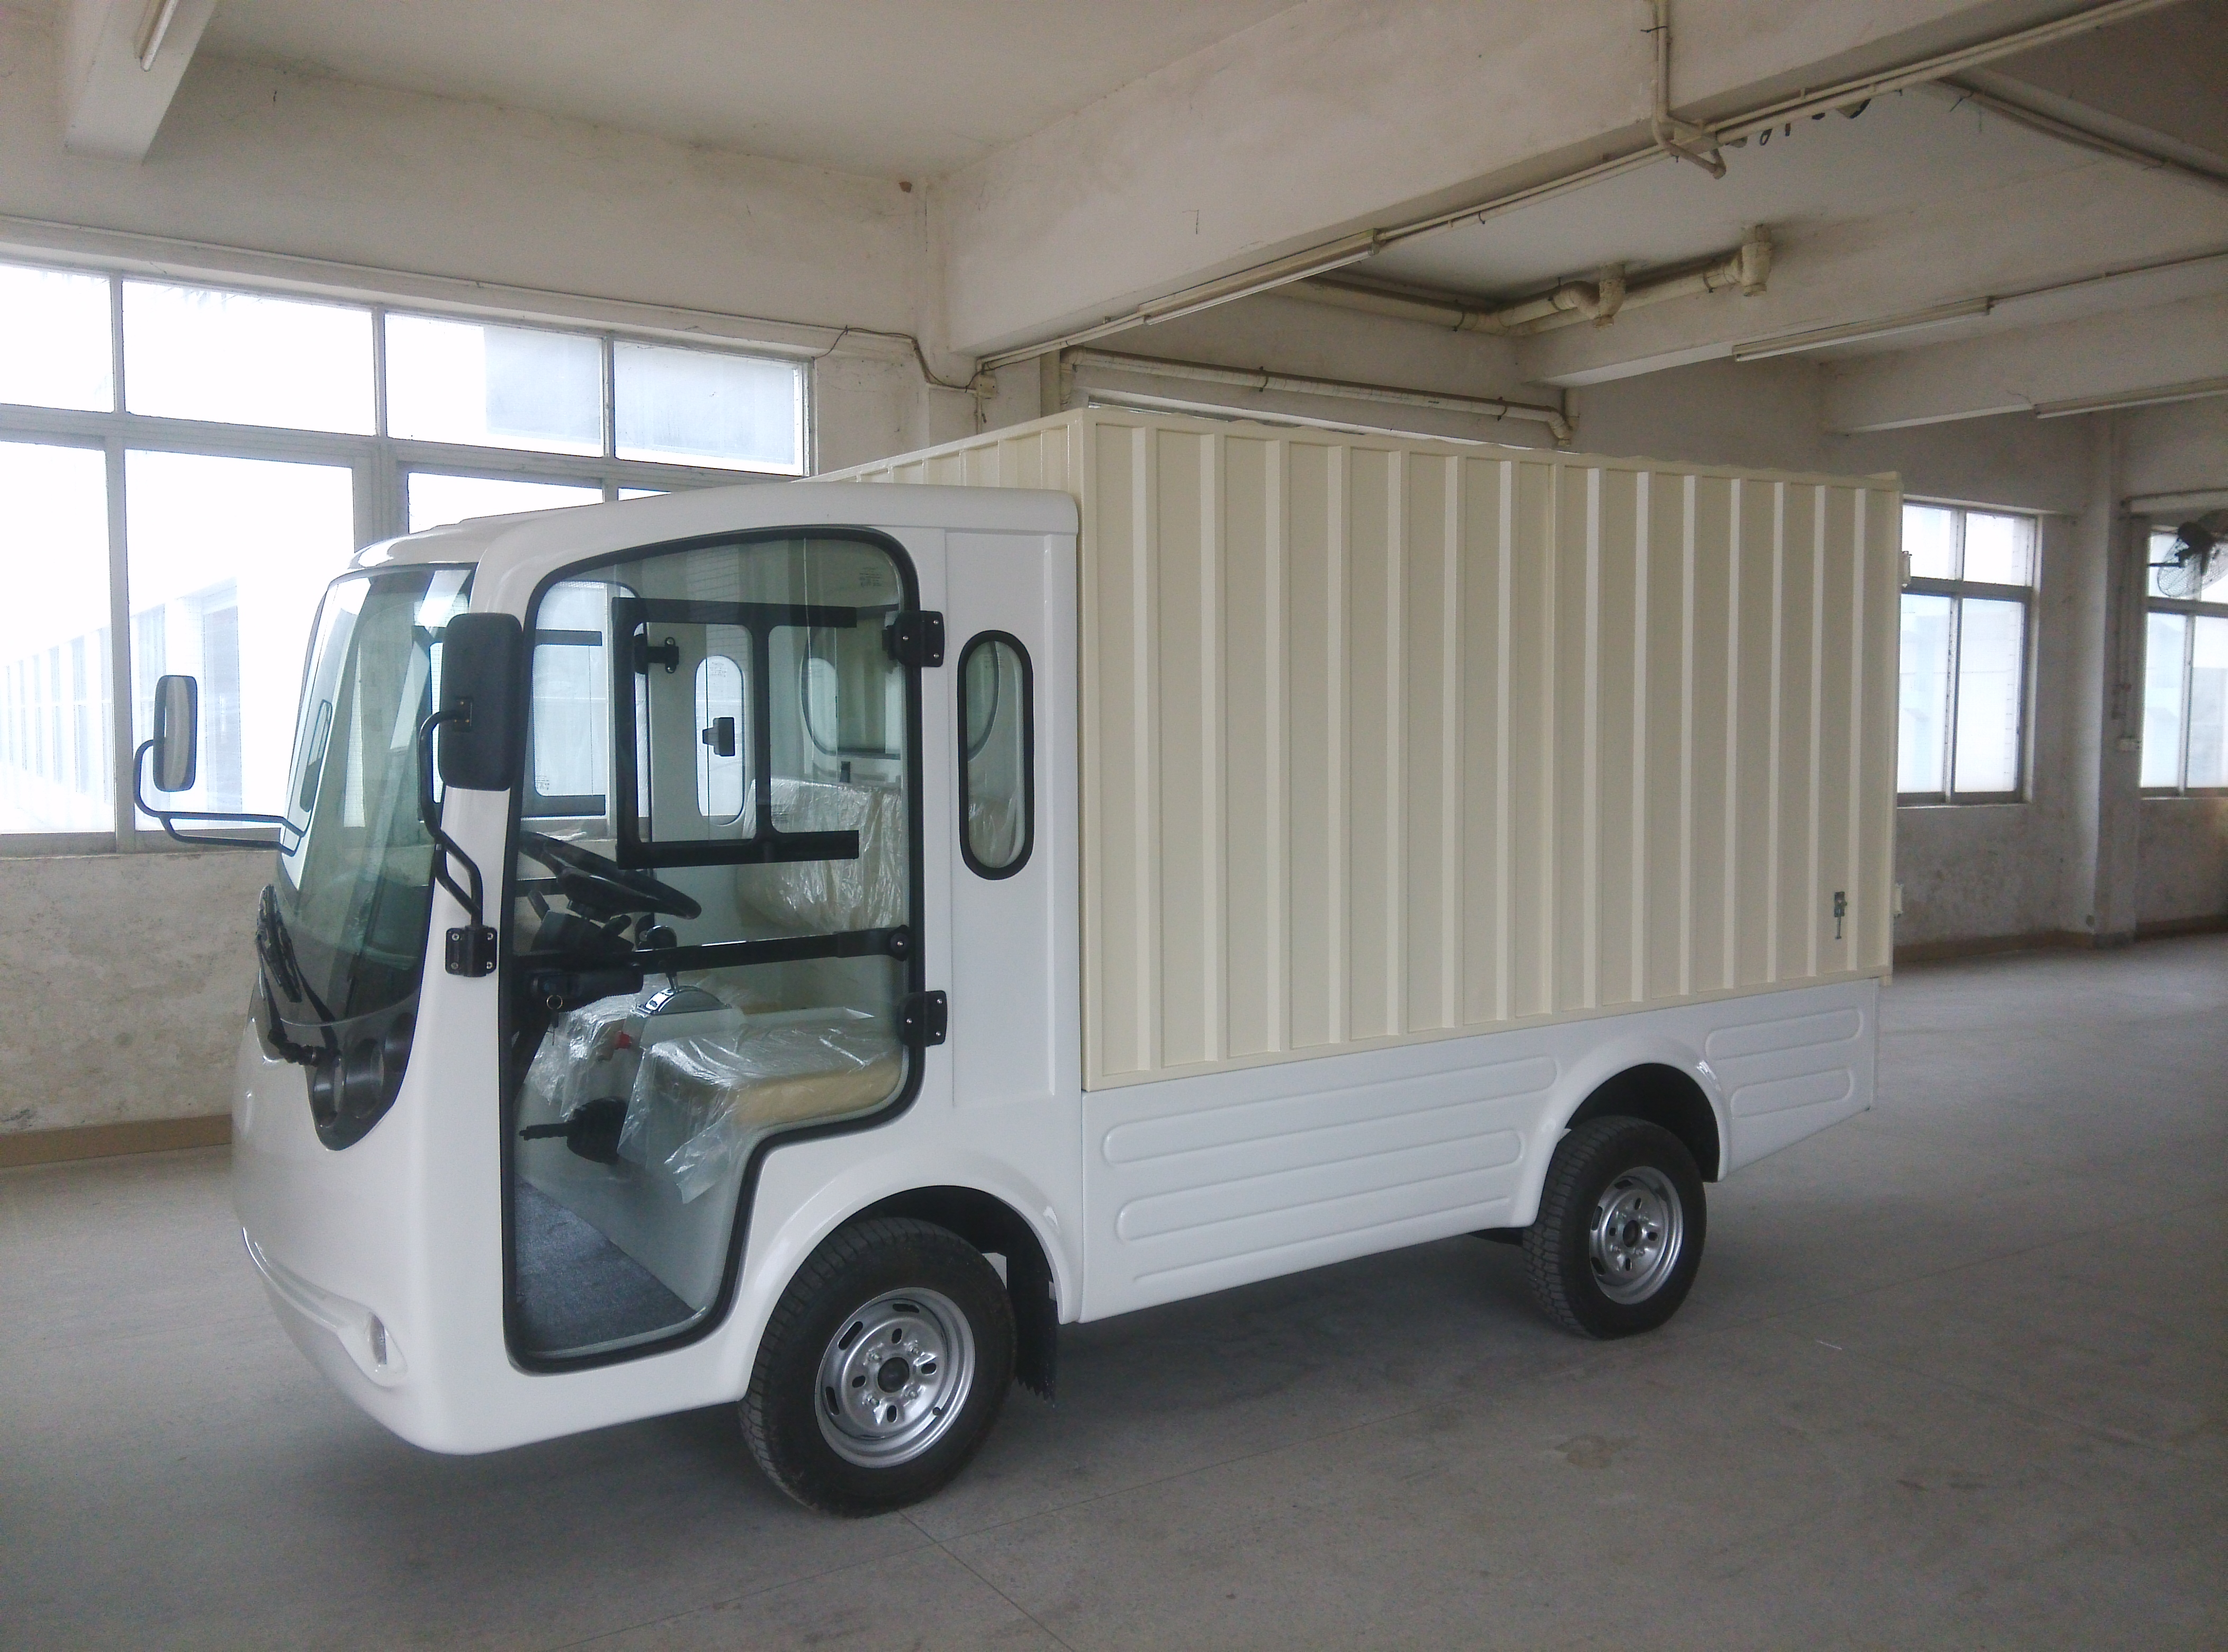 ECARMAS electric truck van